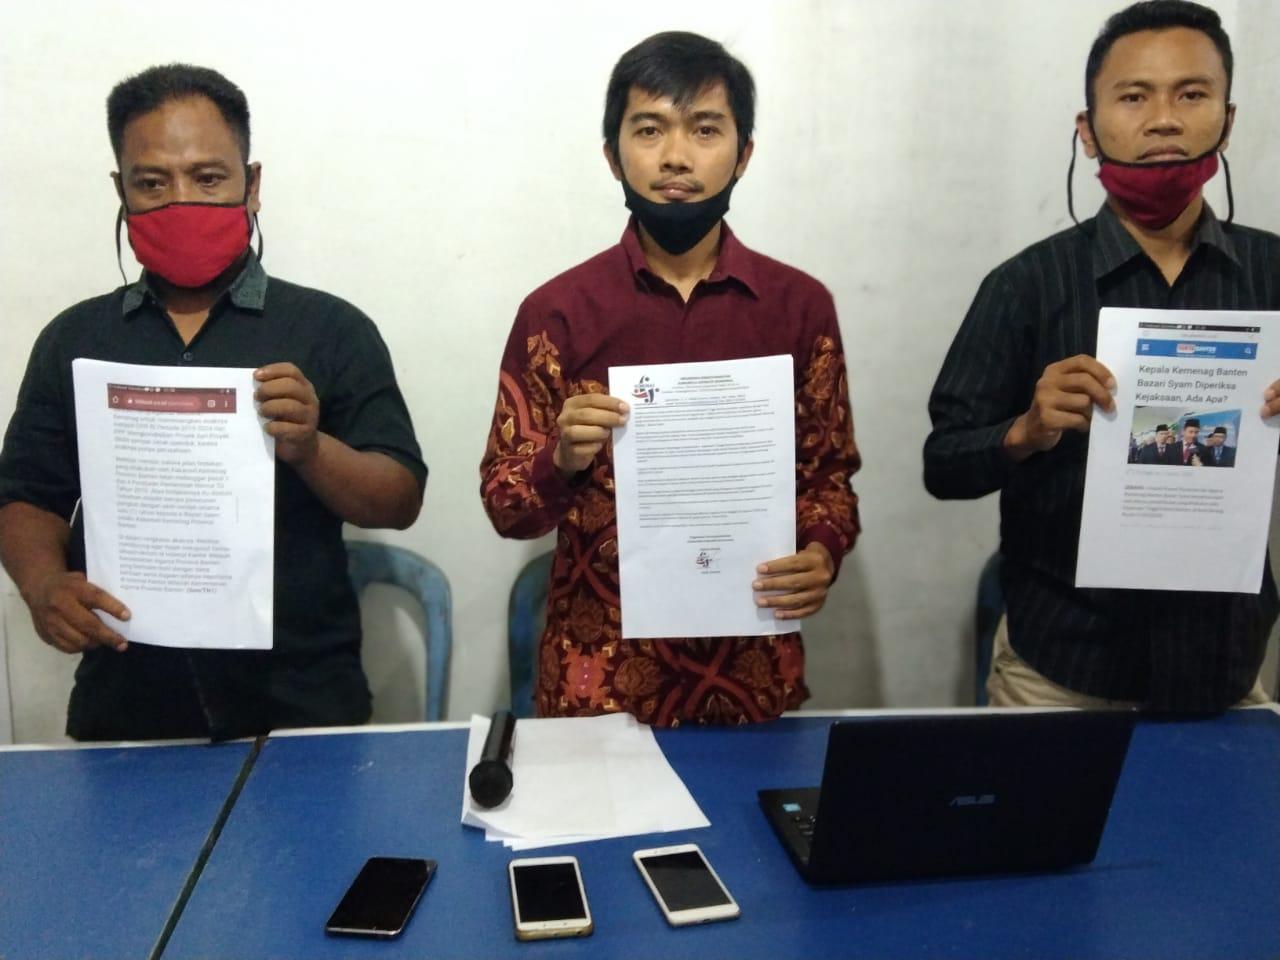 Komunas Akan Datangi KPK, Minta KPK Supervisi Kejati ...